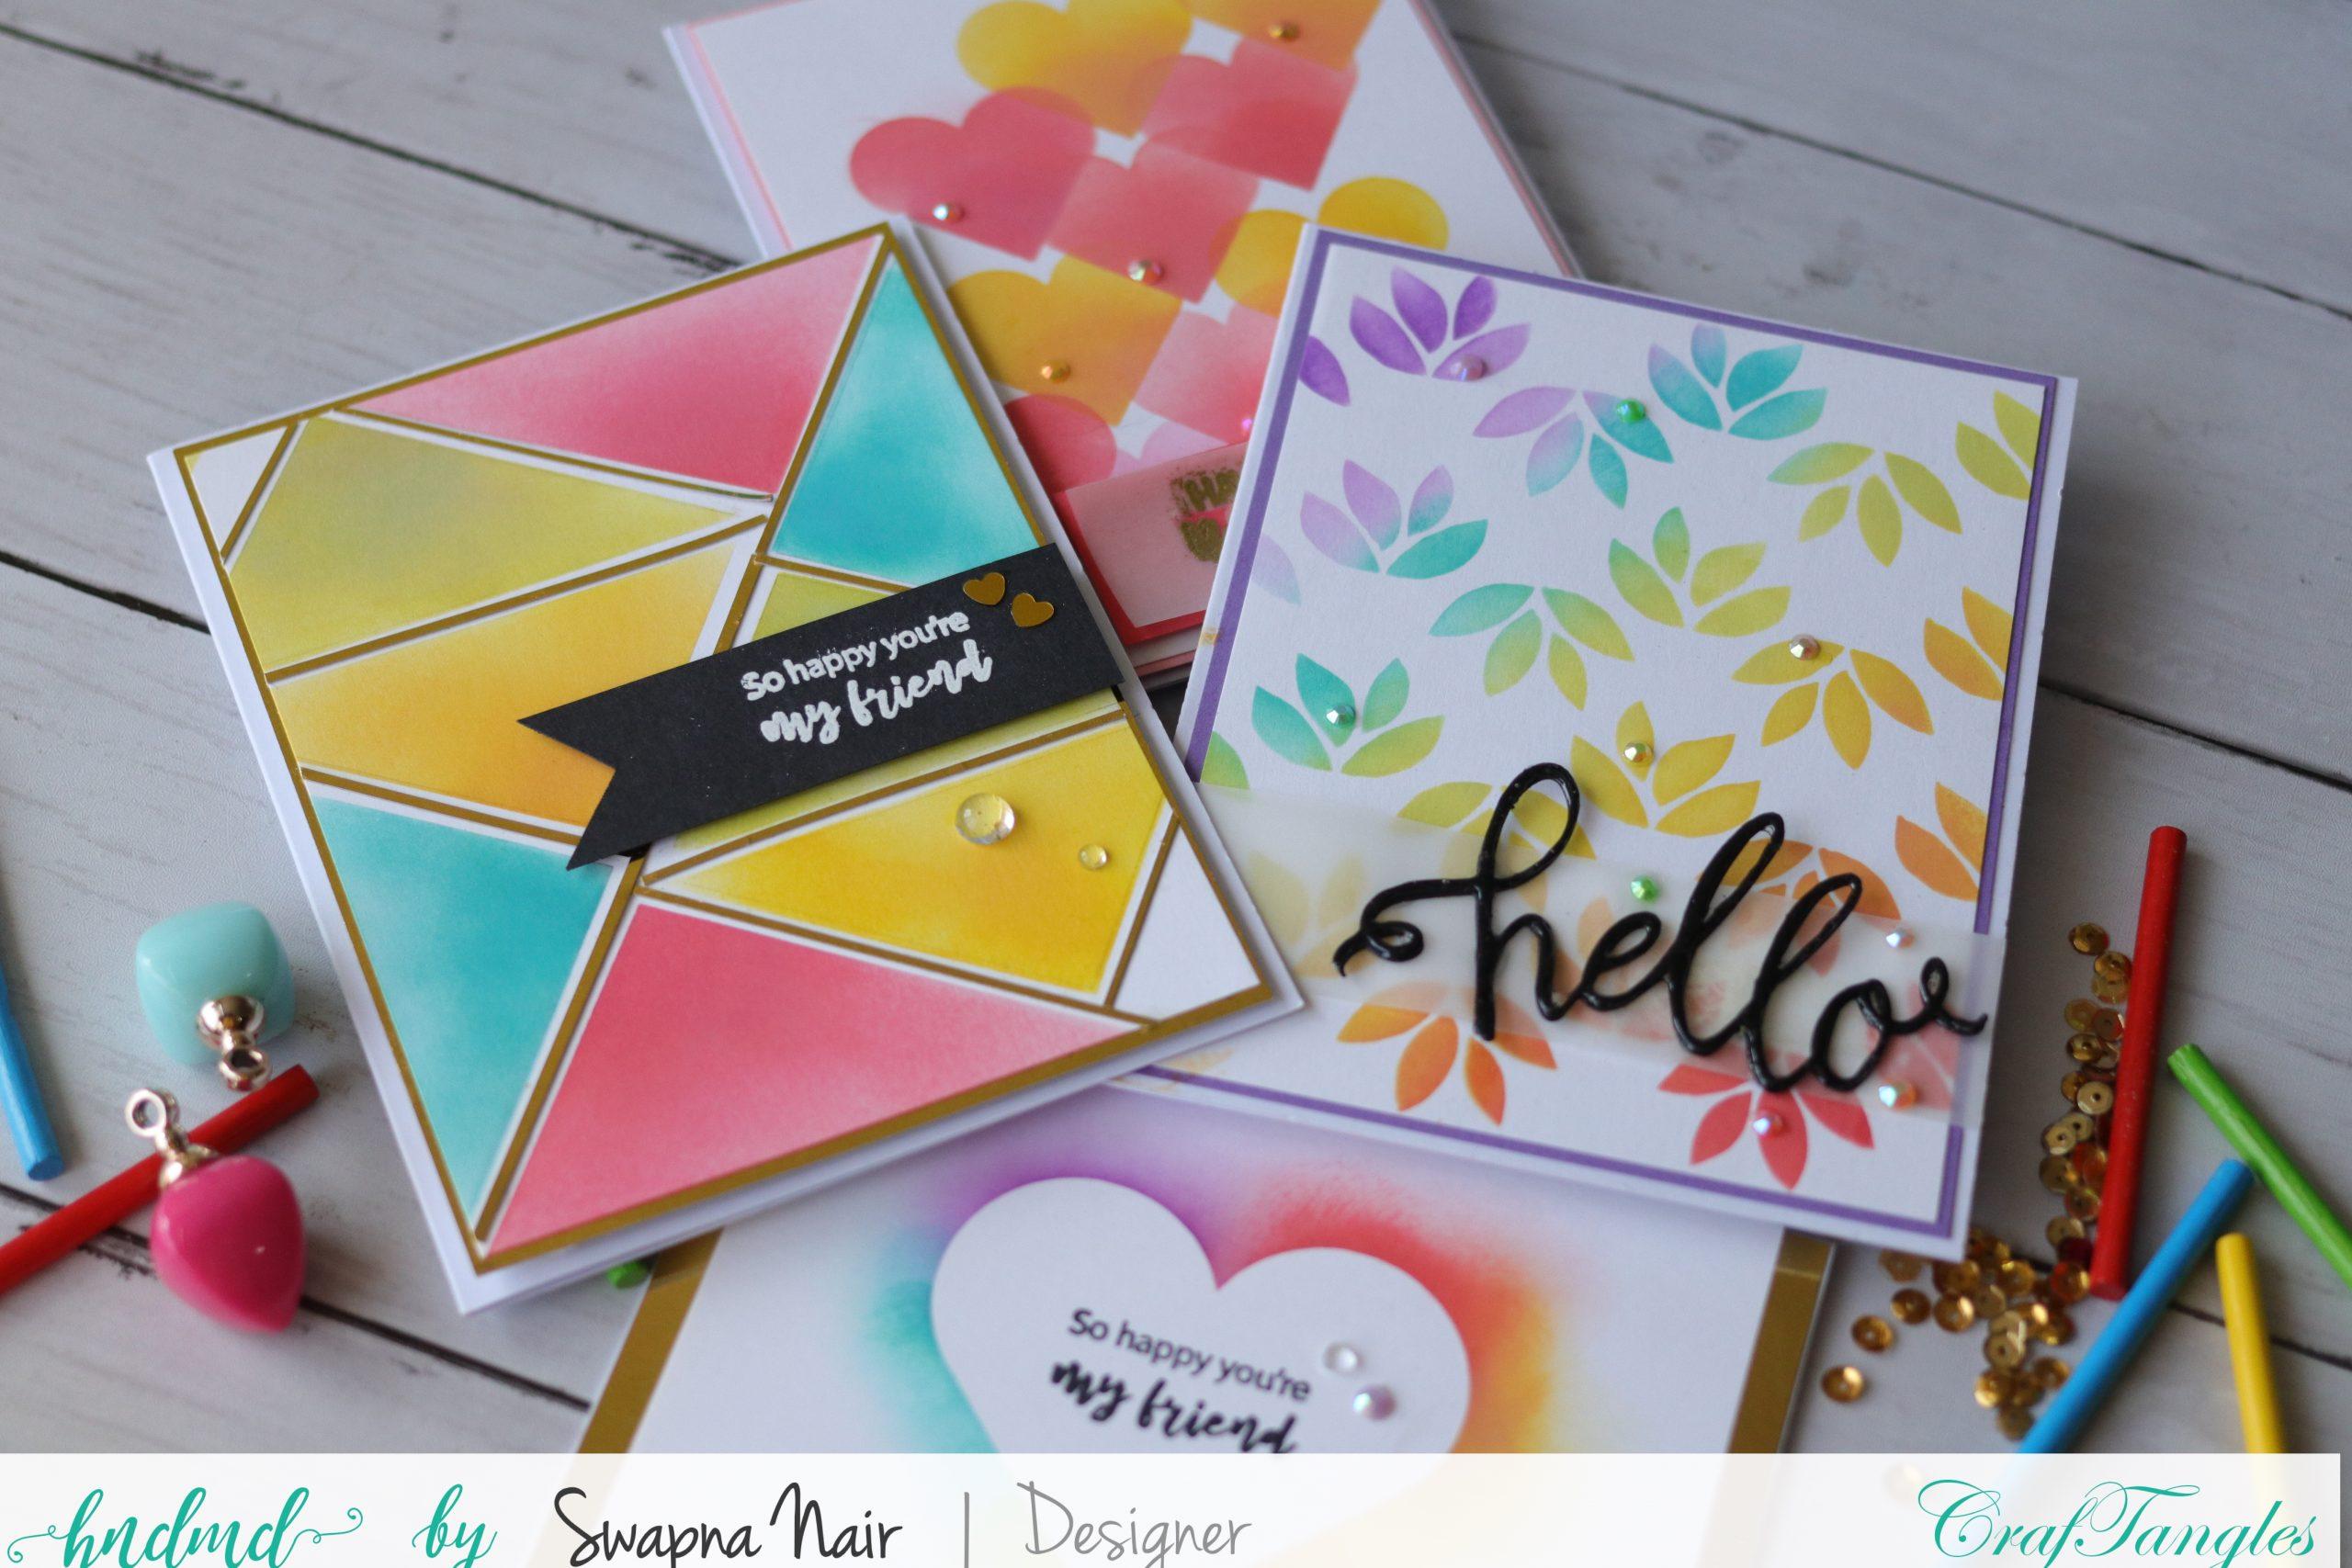 Cardmaking Ideas - 4 Easy Cards using Stencils 7